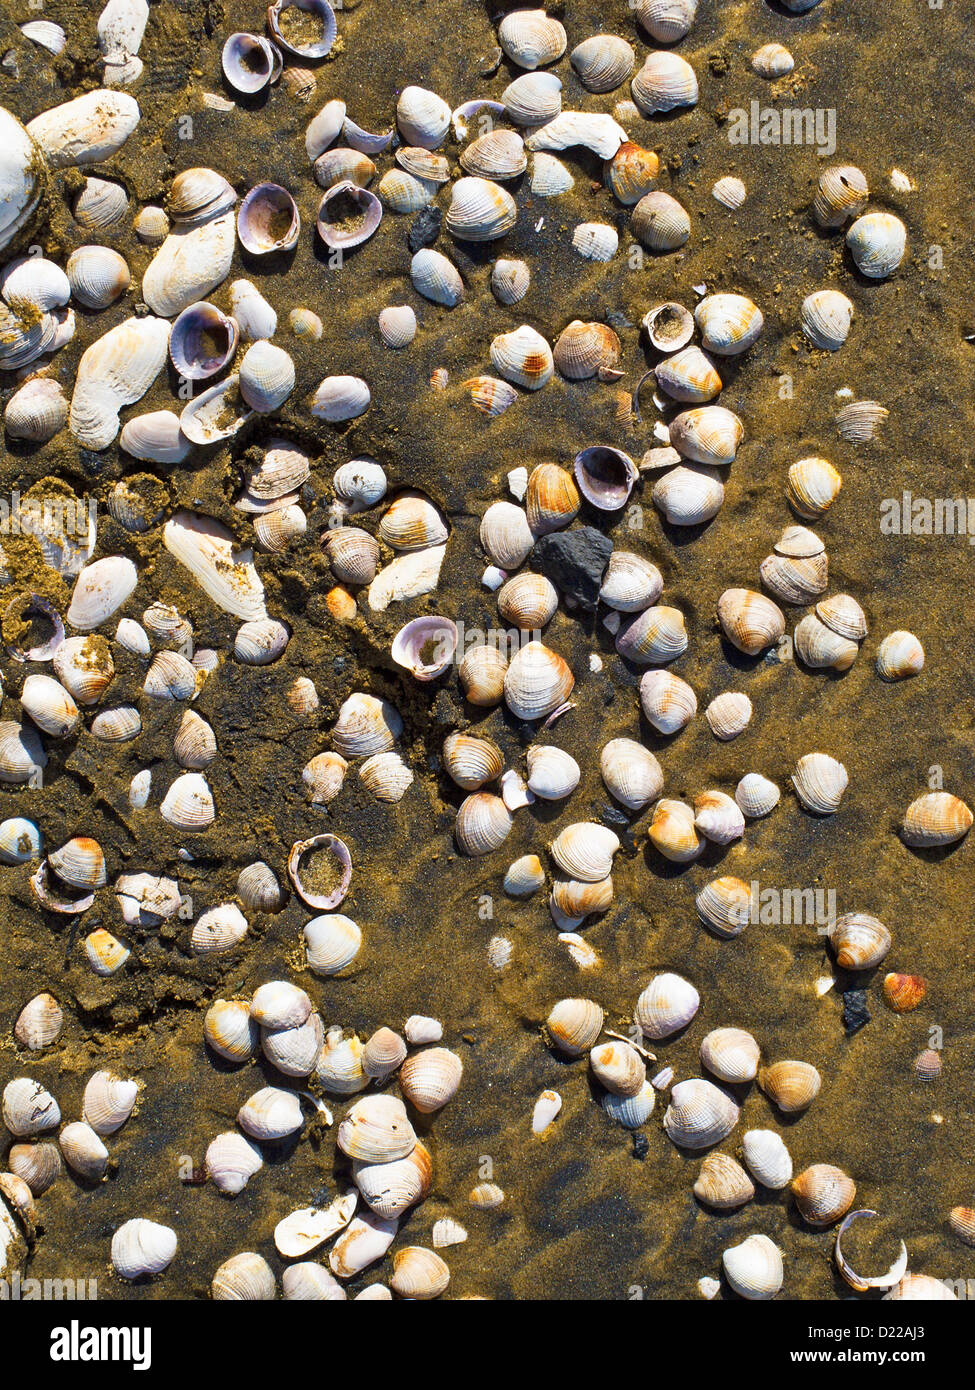 Shells on the sandy beach at Te Arai Point, Mangawhai, Northland, North Island, New Zealand. - Stock Image